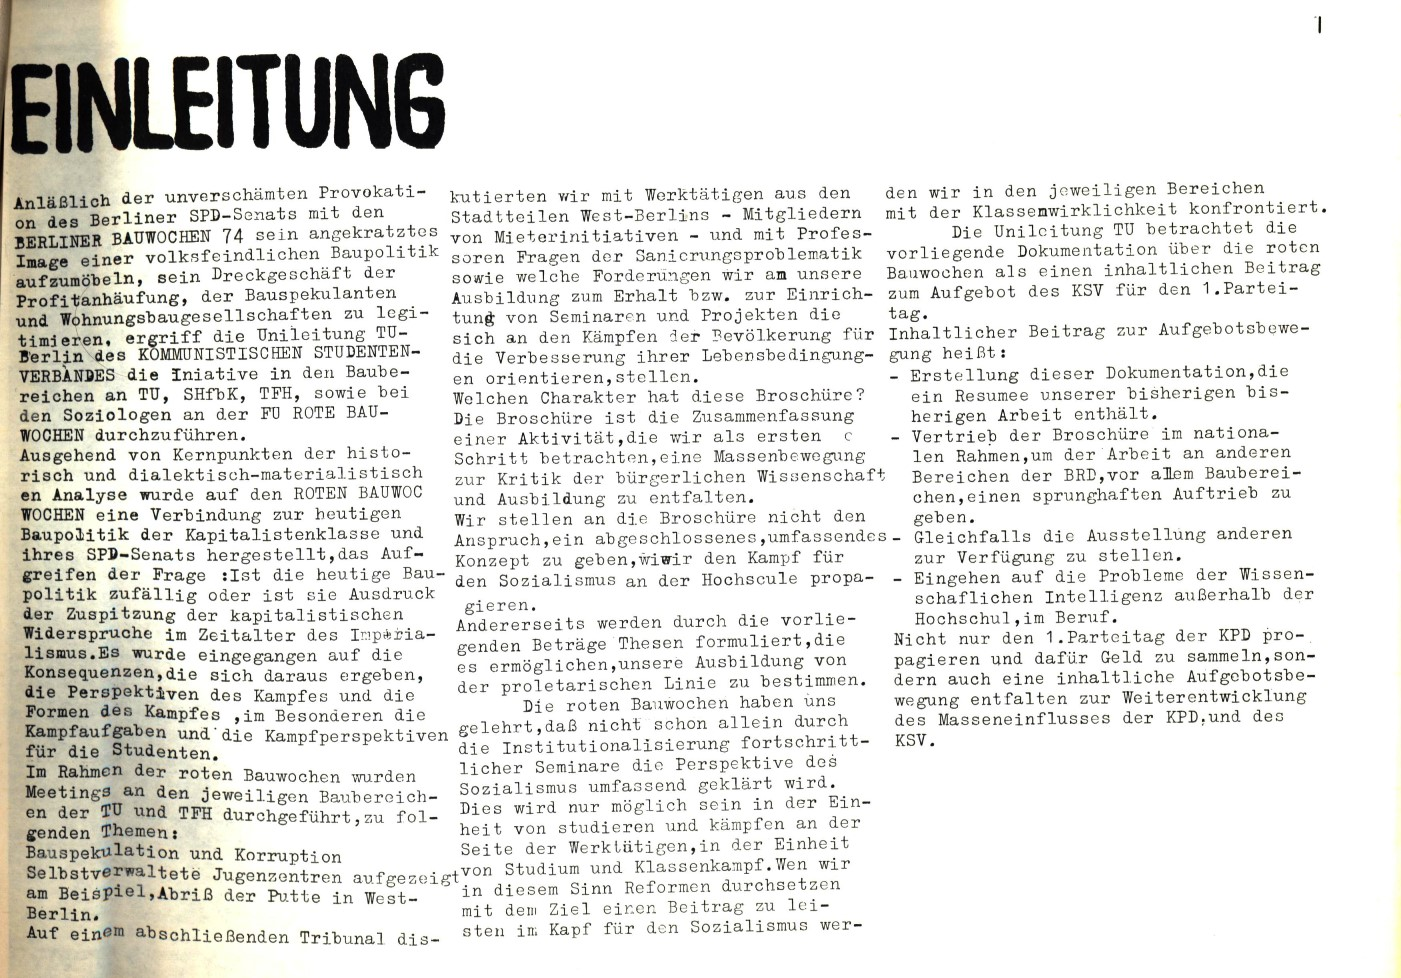 Berlin_KSV_1974_Rote_Bauwochen_05